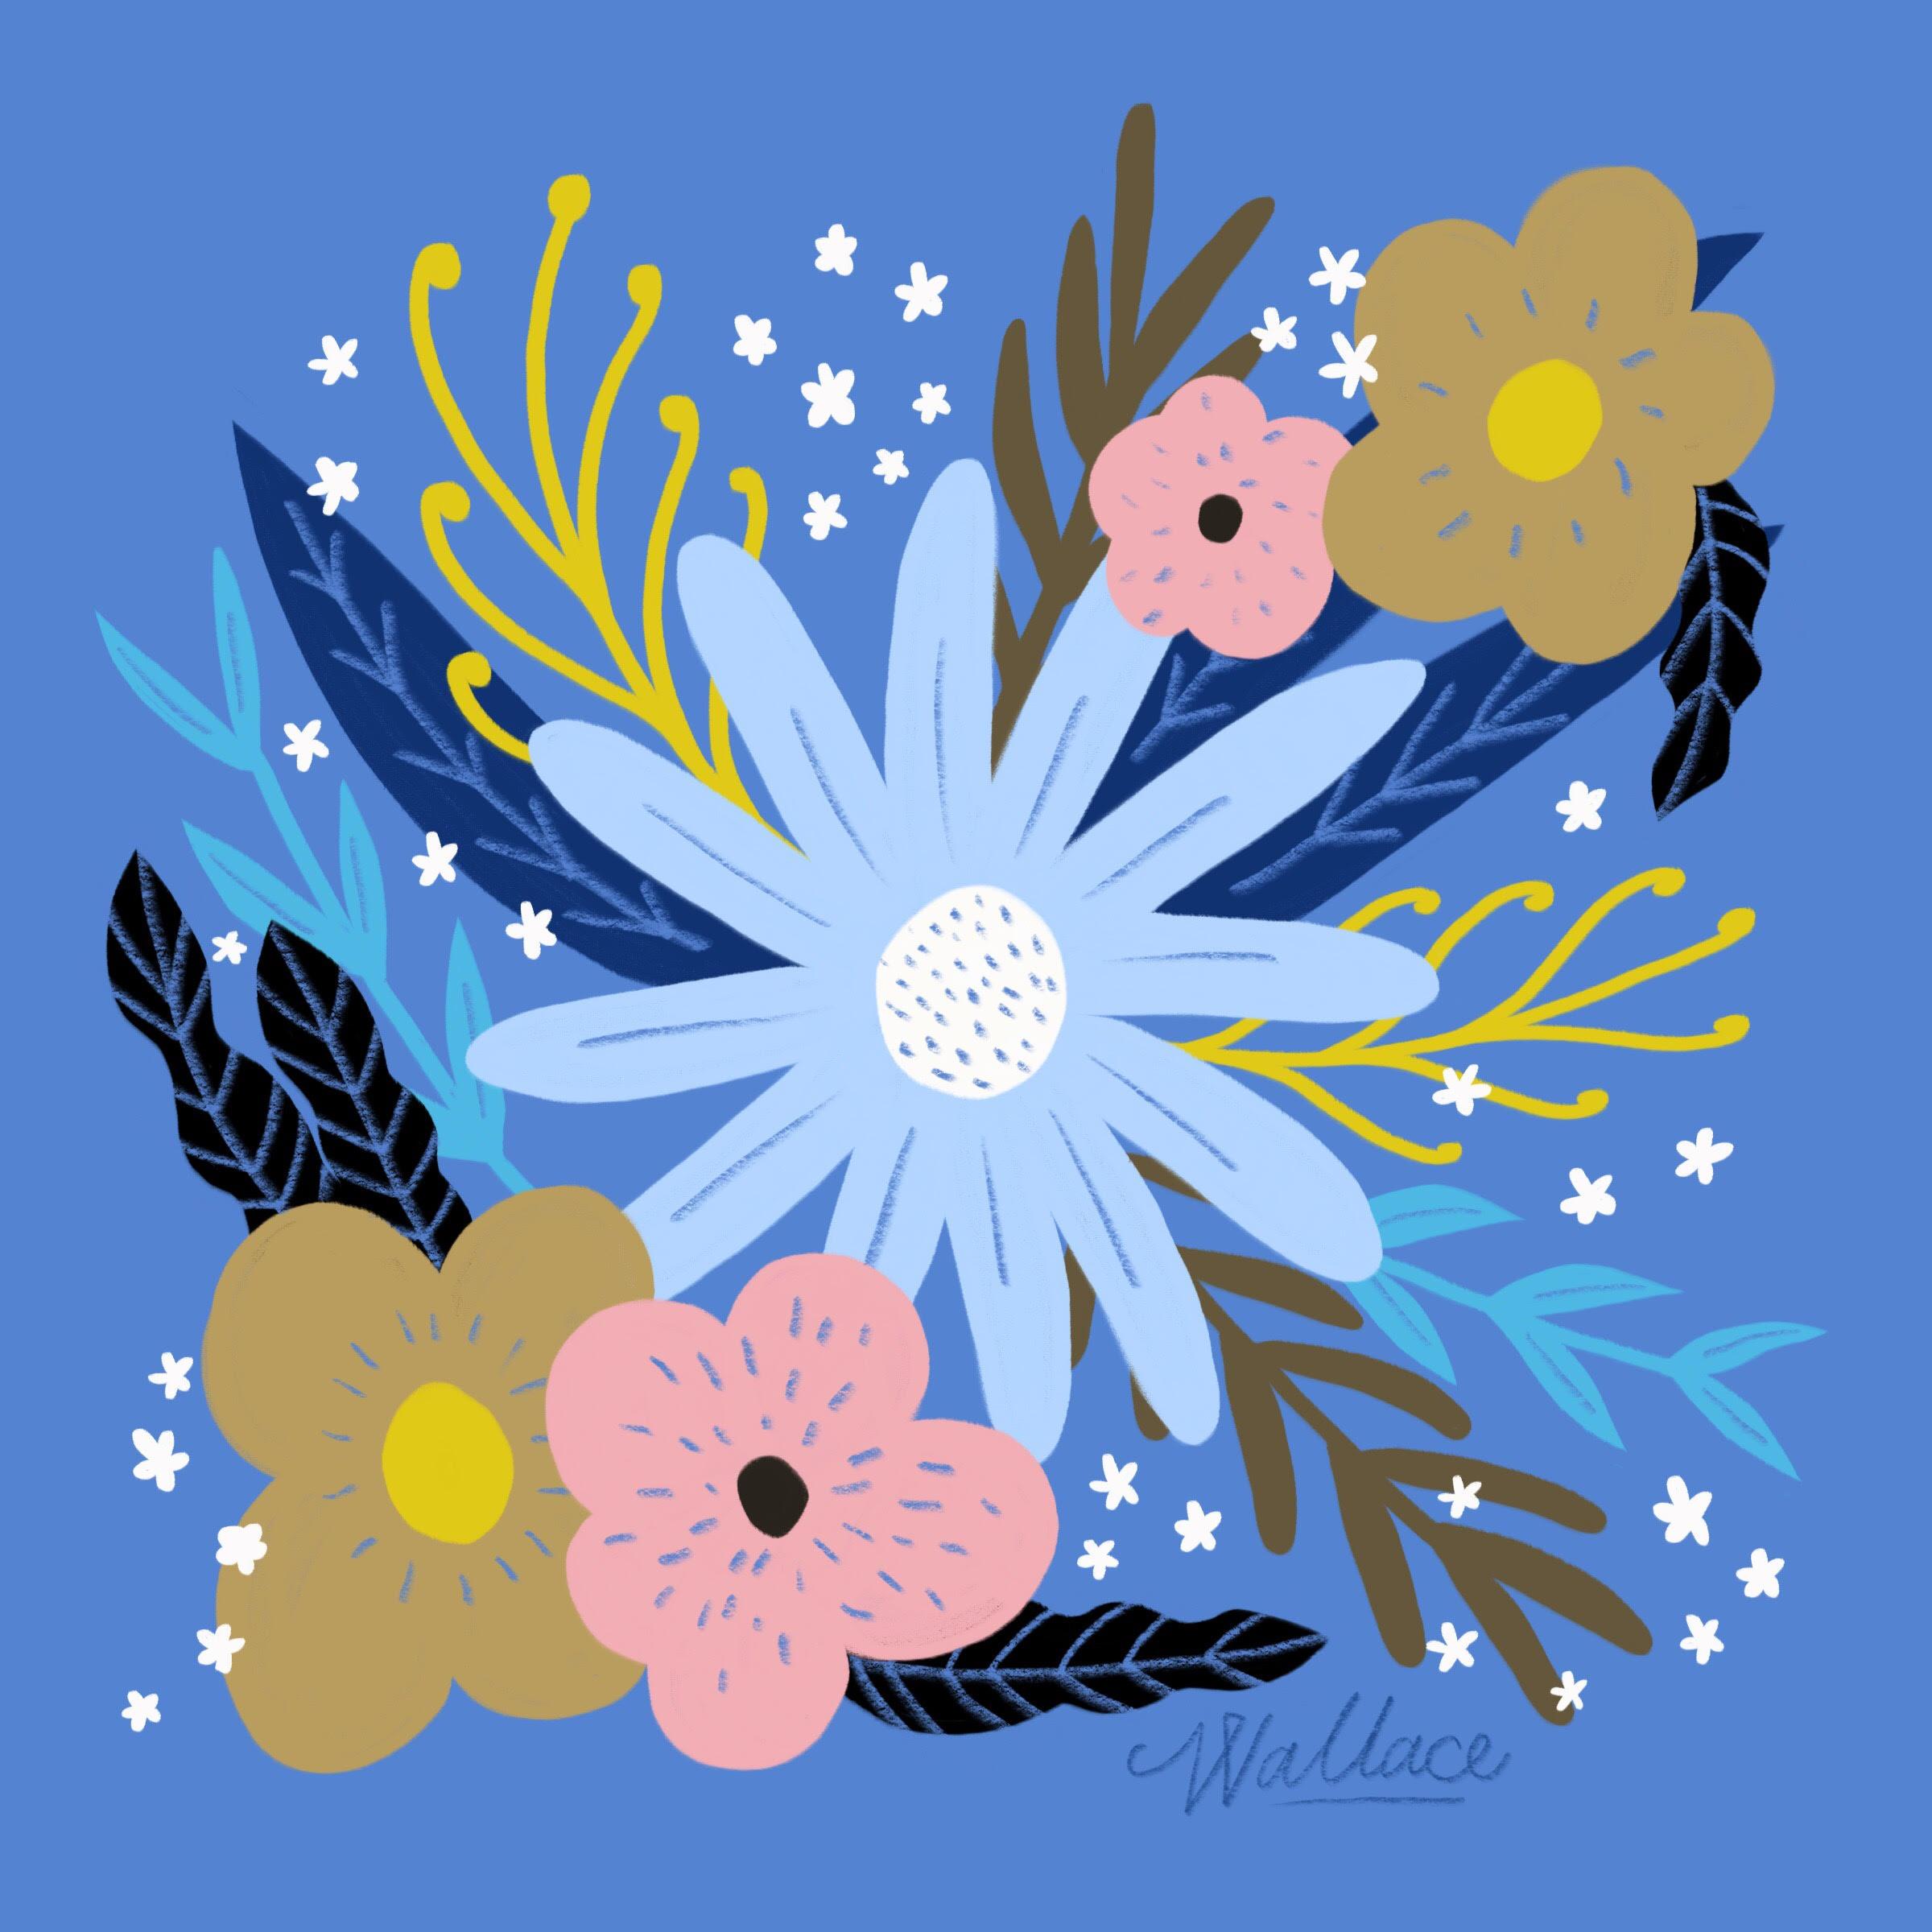 blue-flower-illustration-erin-wallace.jpg